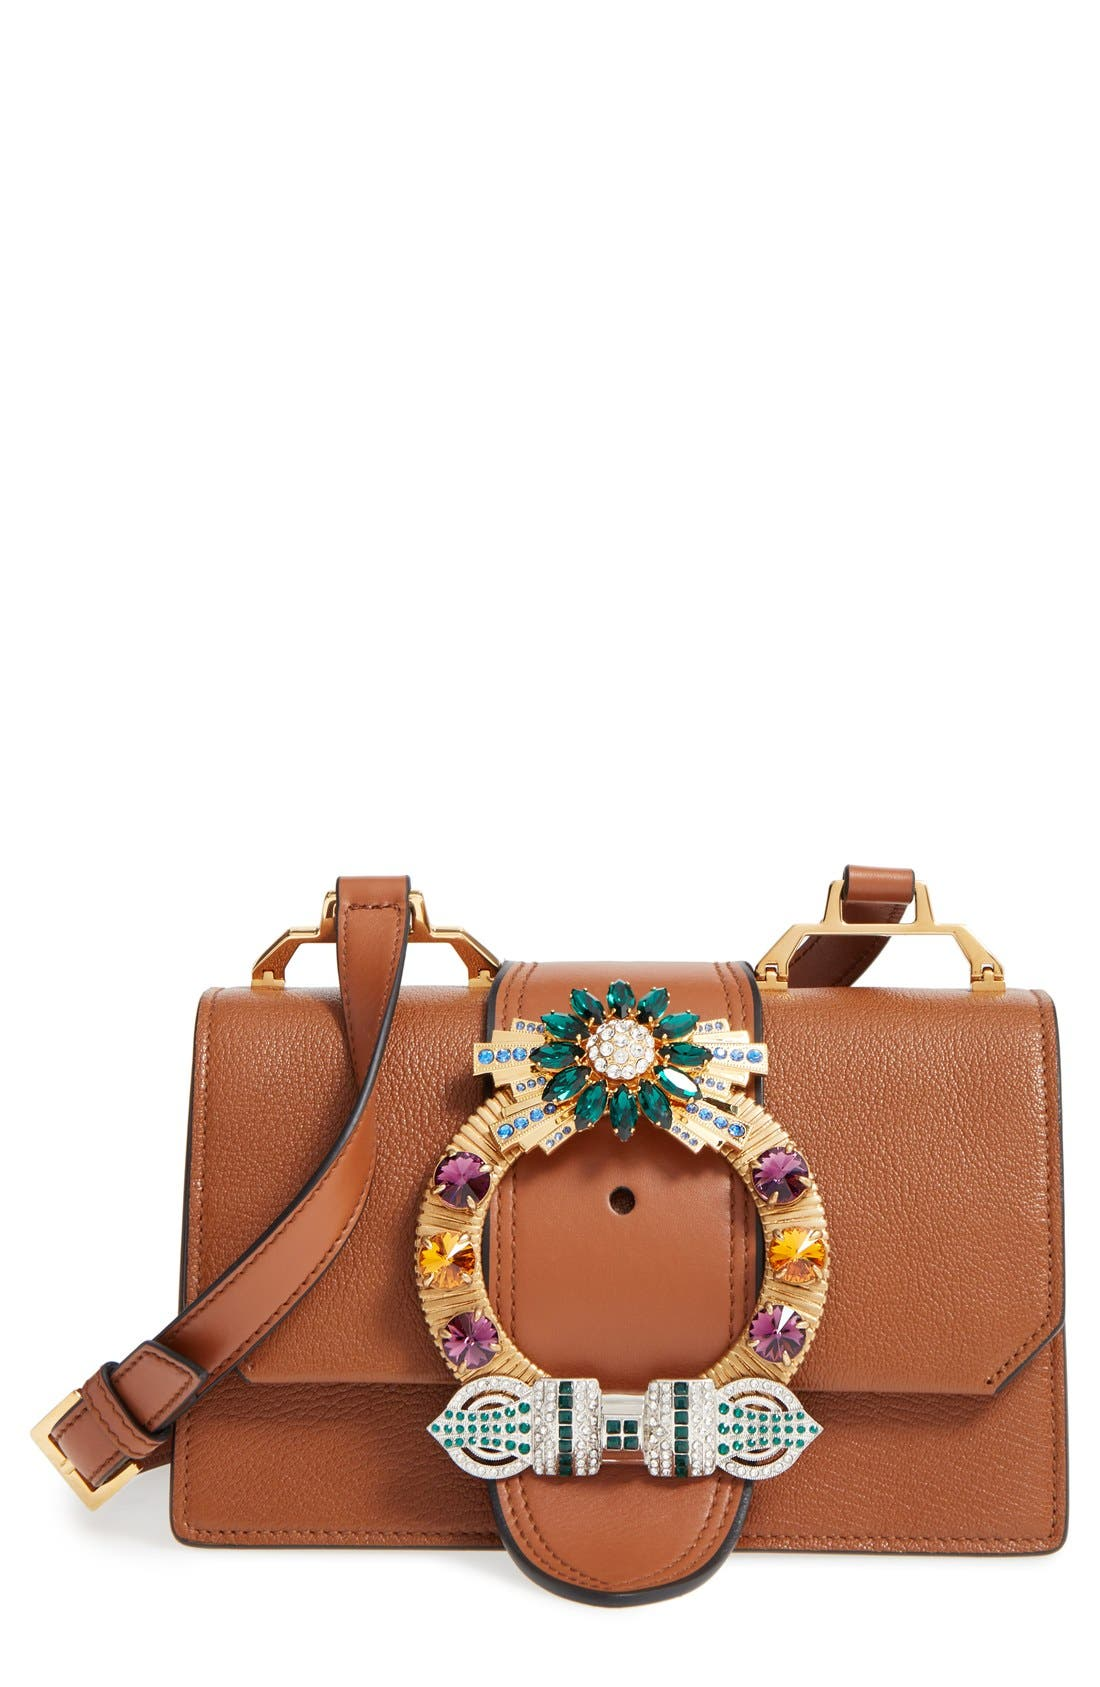 Alternate Image 1 Selected - Miu Miu 'Small Madras' Crystal Embellished Leather Shoulder Bag